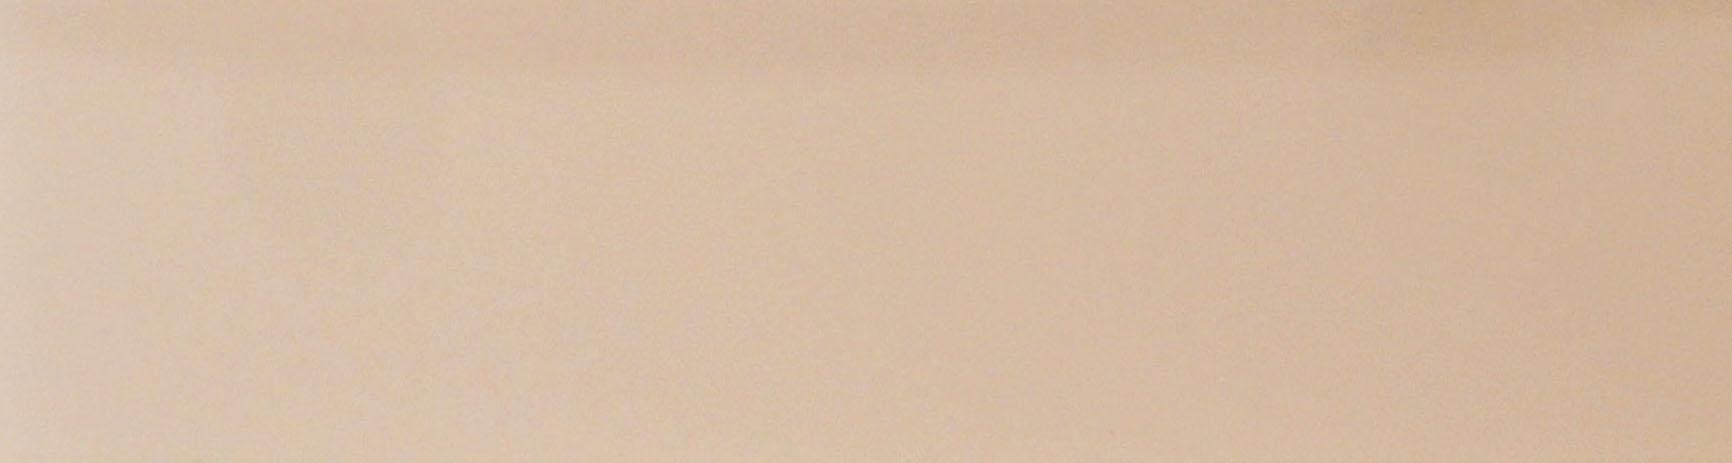 16631 -  Olive  22 x 2 mm